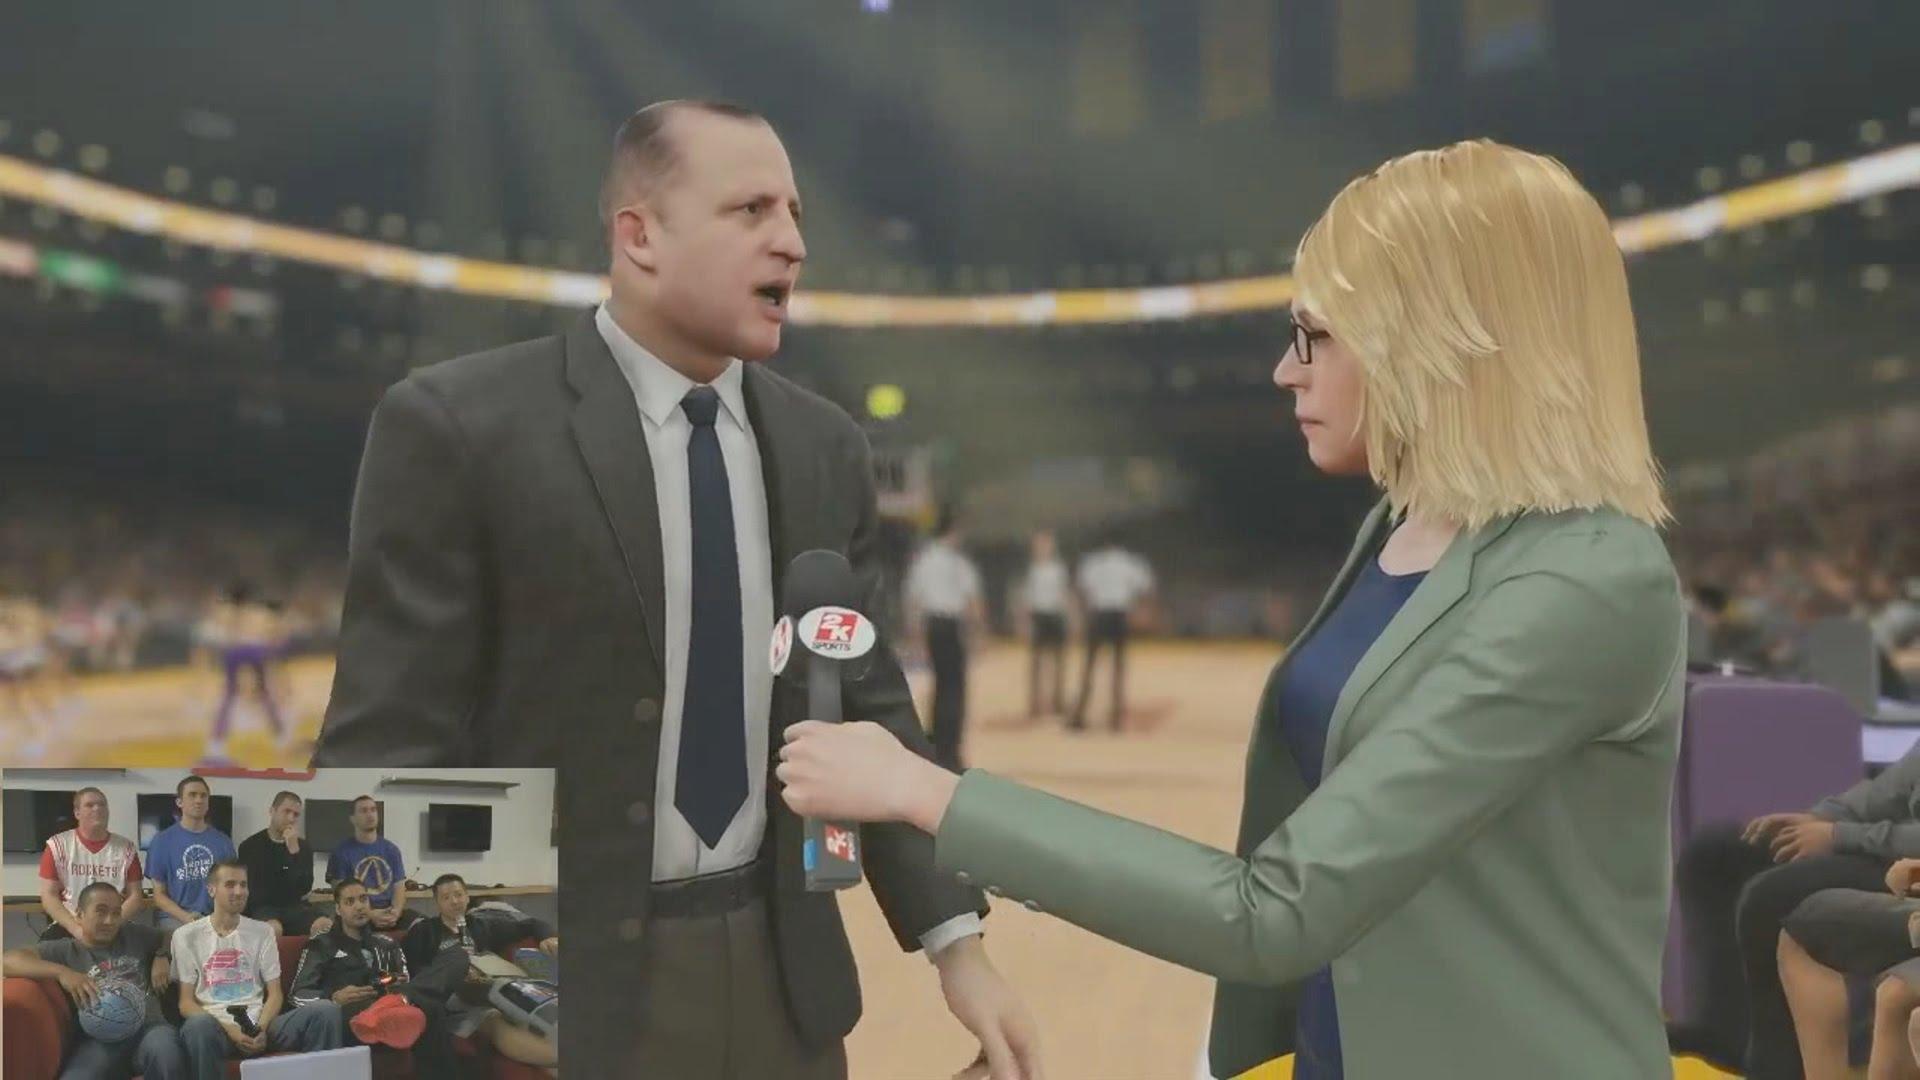 NBA 2K15 PS4 Bulls vs. Lakers 48 Minuten Gameplay